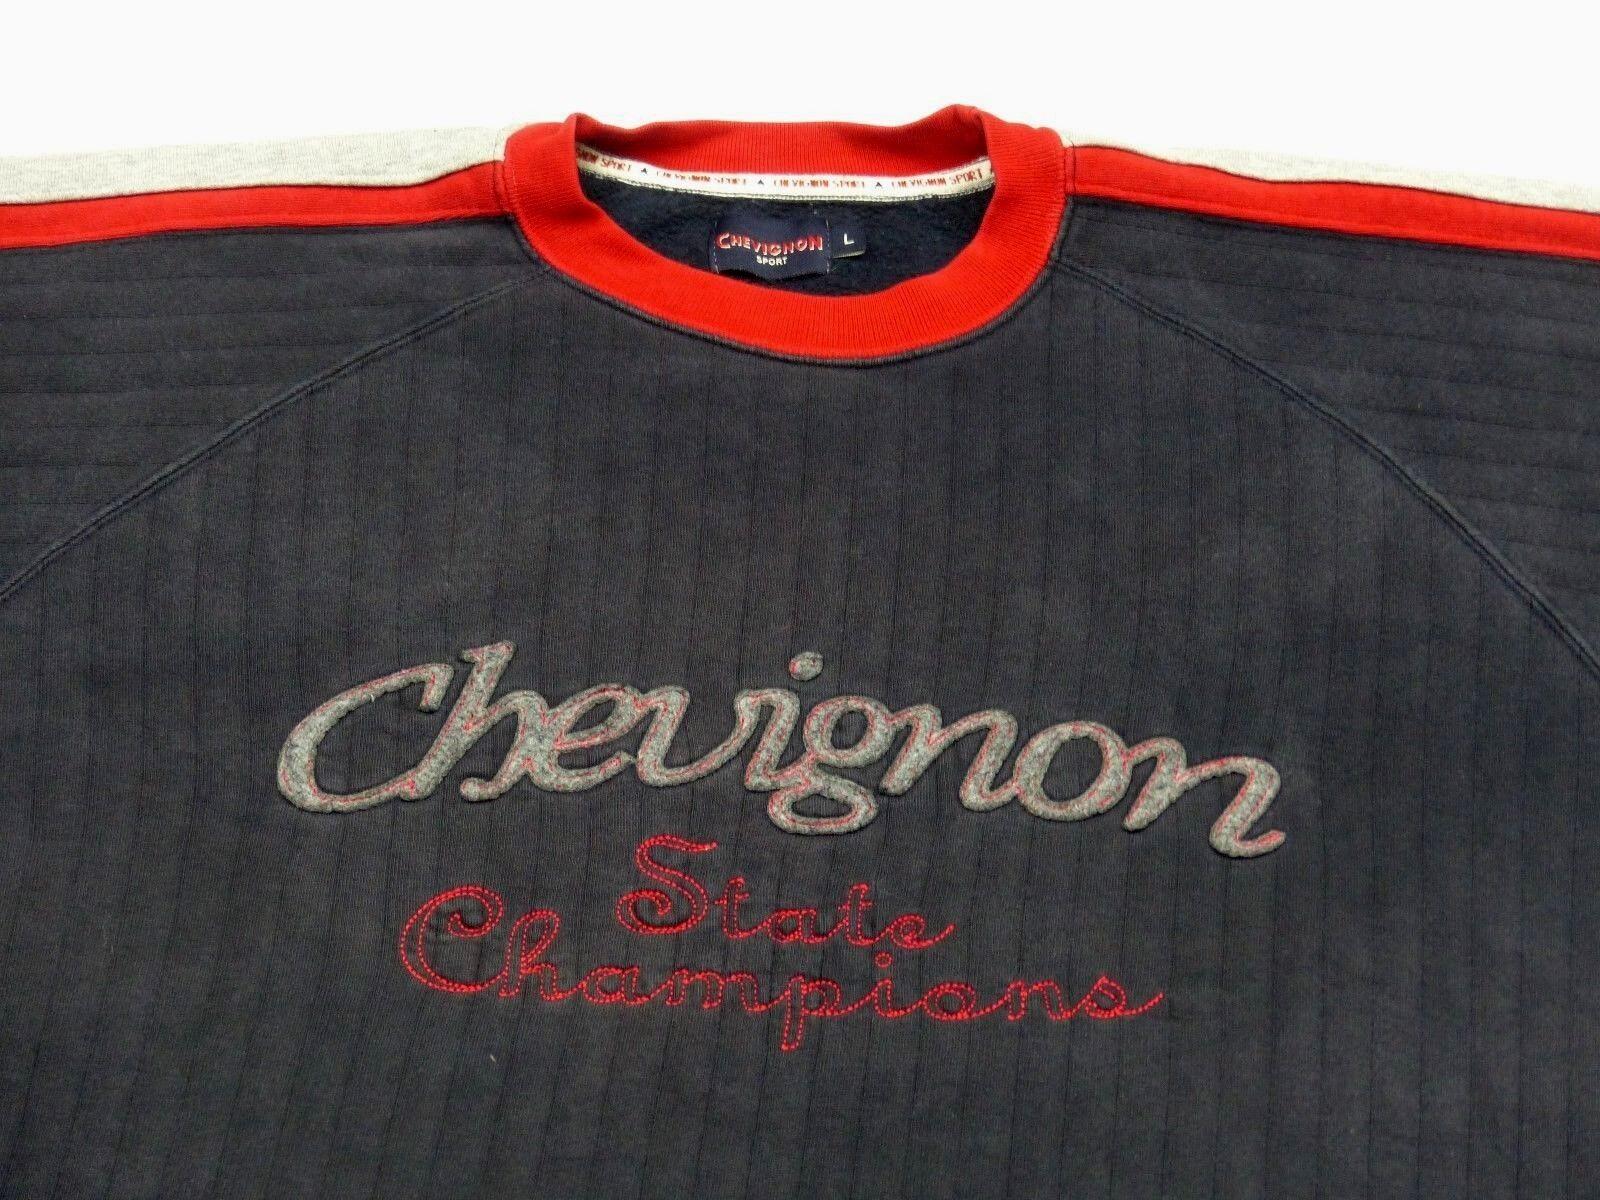 CHARLES CHEVIGNON VINTAGE PULLOVERSTATE CHAMPIONHOOLIGANSGR: LTIP TOP